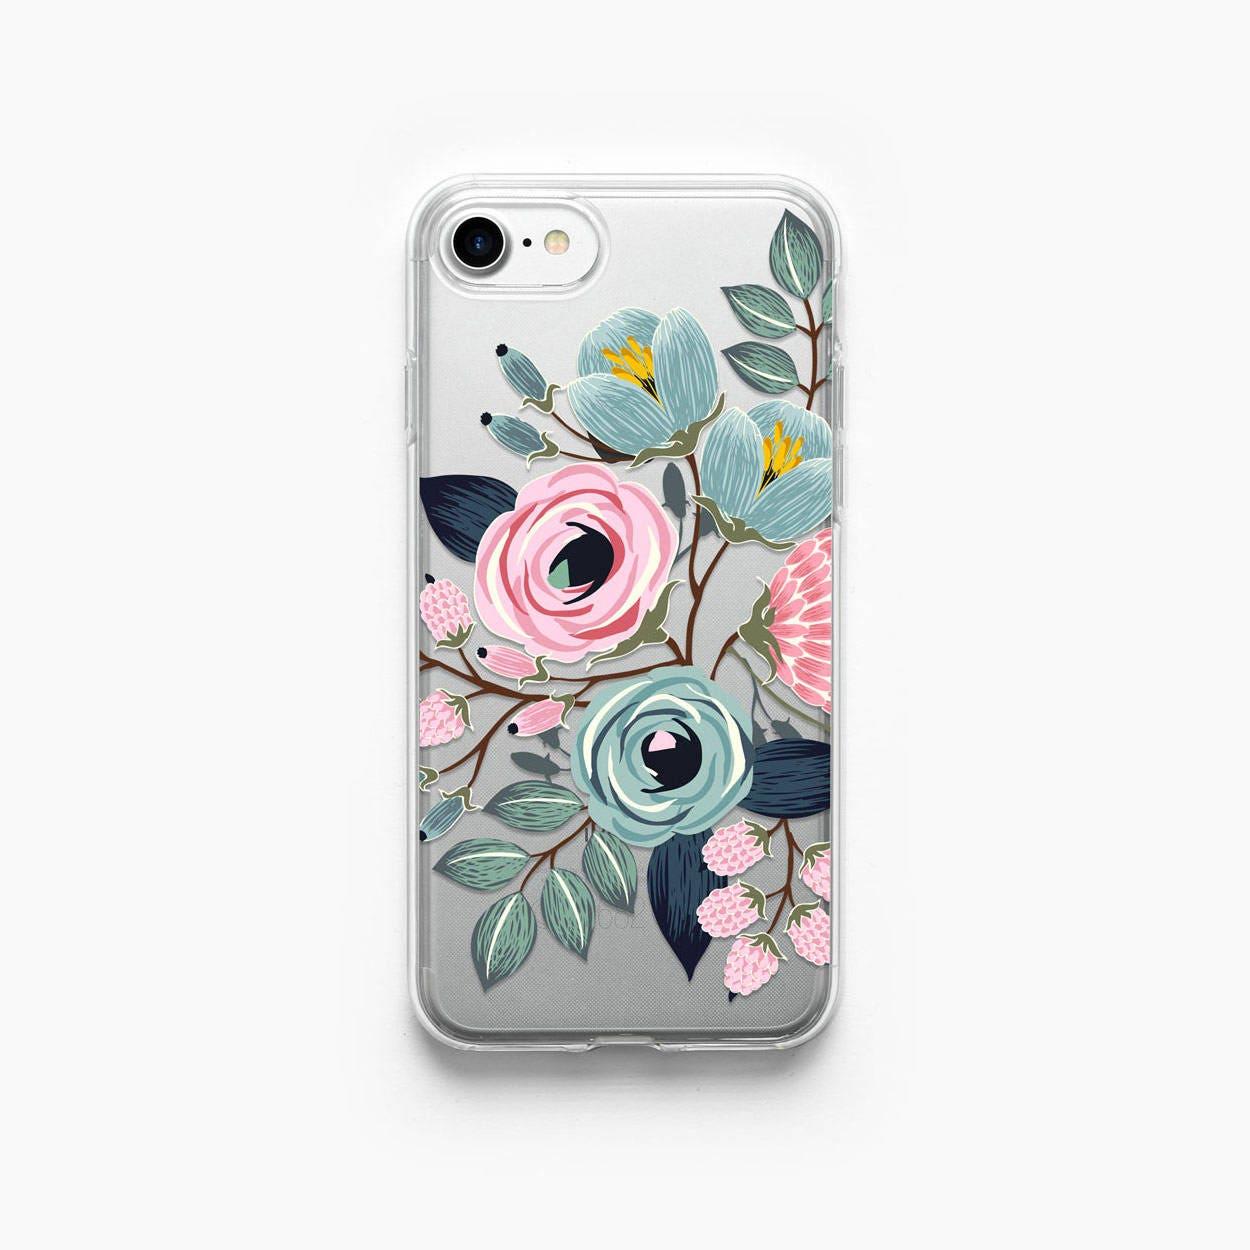 Iphone Case Floral Iphone 7 Case Iphone 7 Plus Case Iphone 6 Etsy